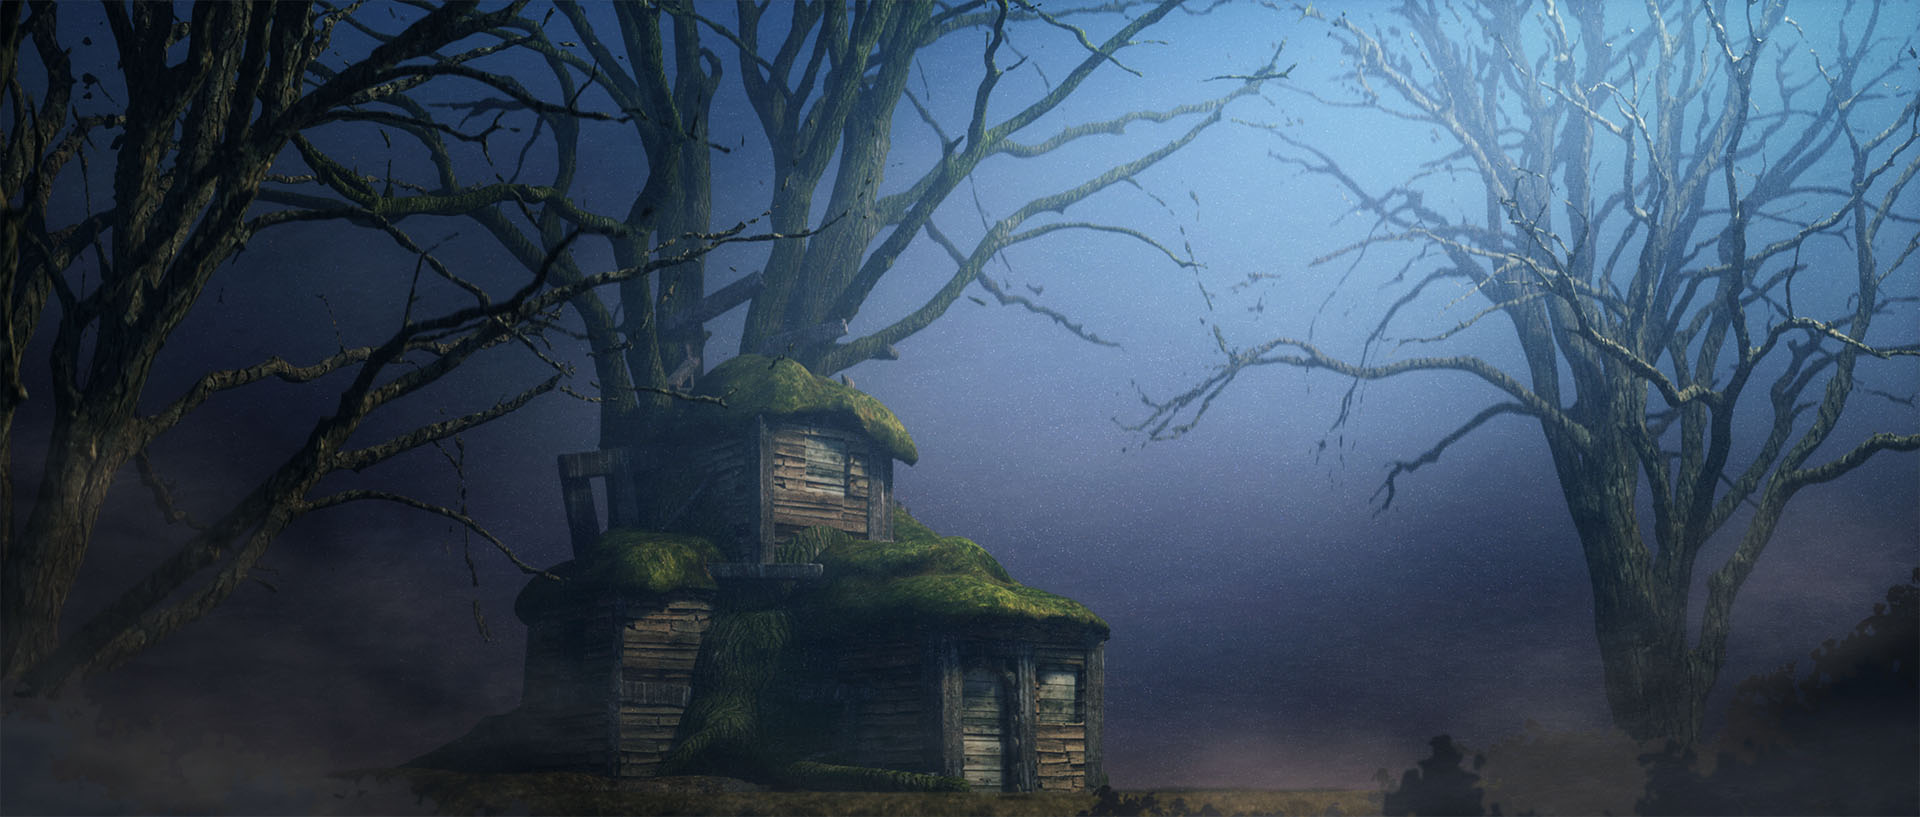 190102 Treehouse1.jpg